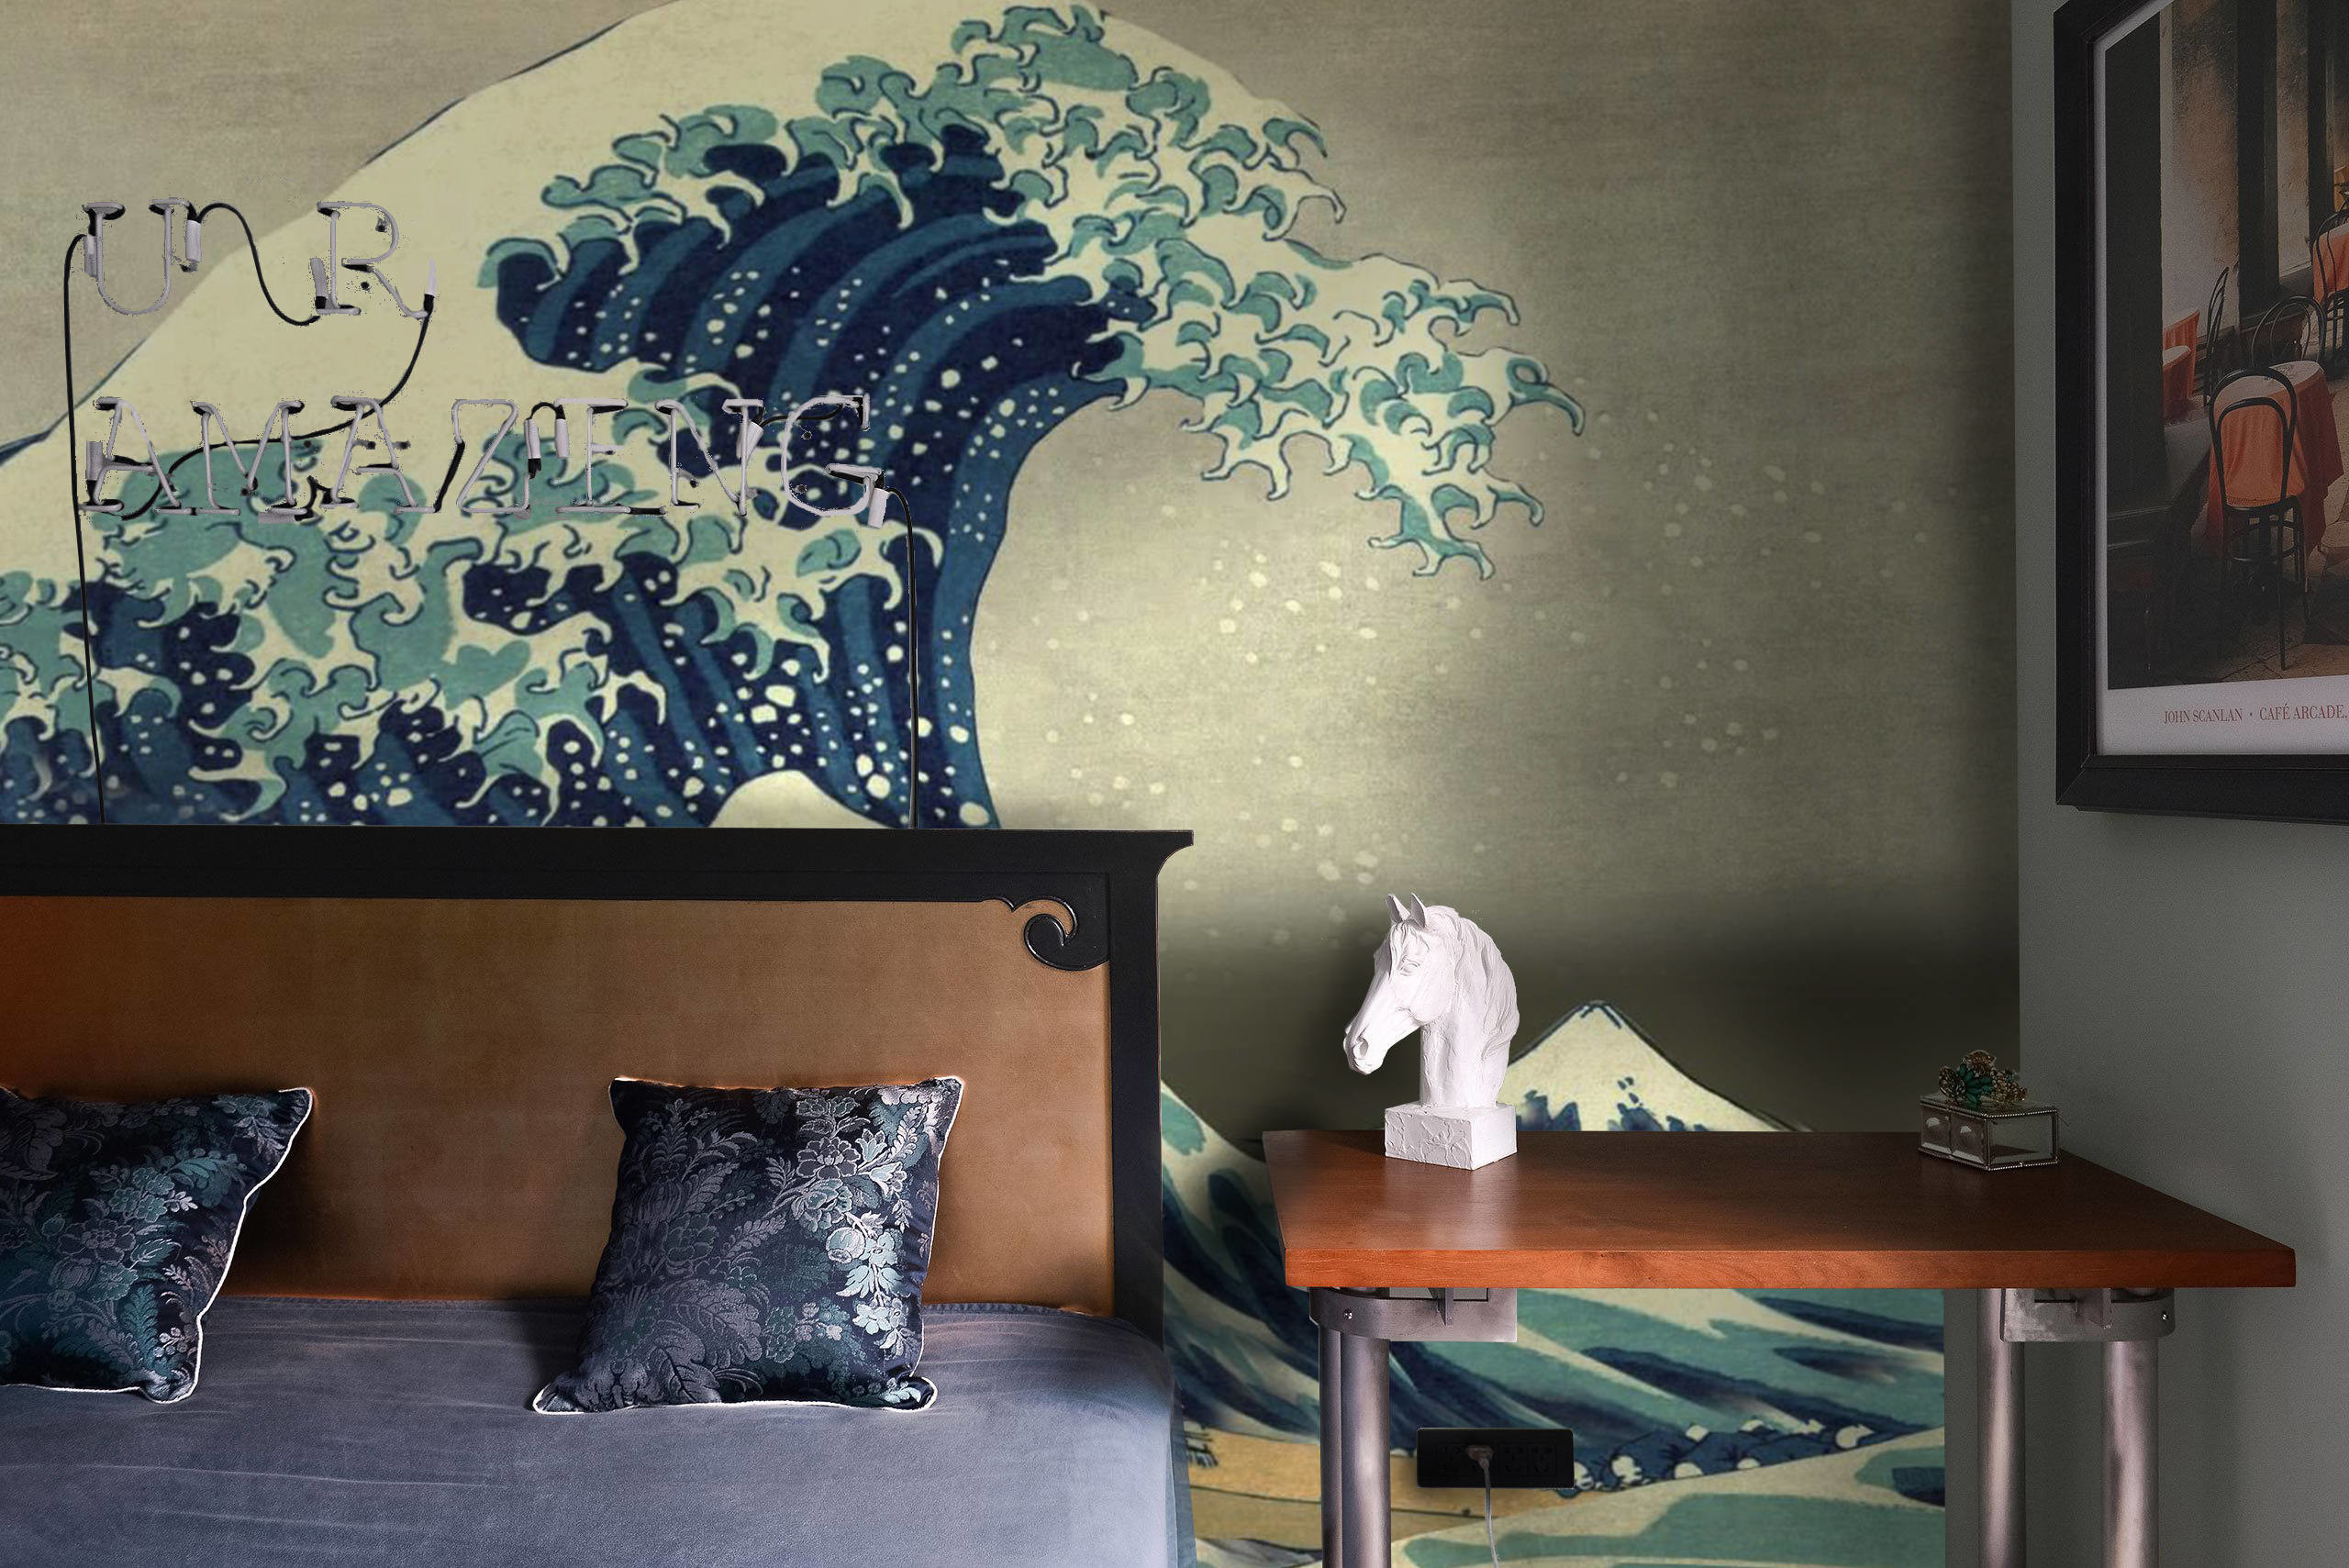 Res: 2560x1709, Great Wave off Kanagawa Wallpapers - Japanese Wallpapers - Asian Wallpaper  mural